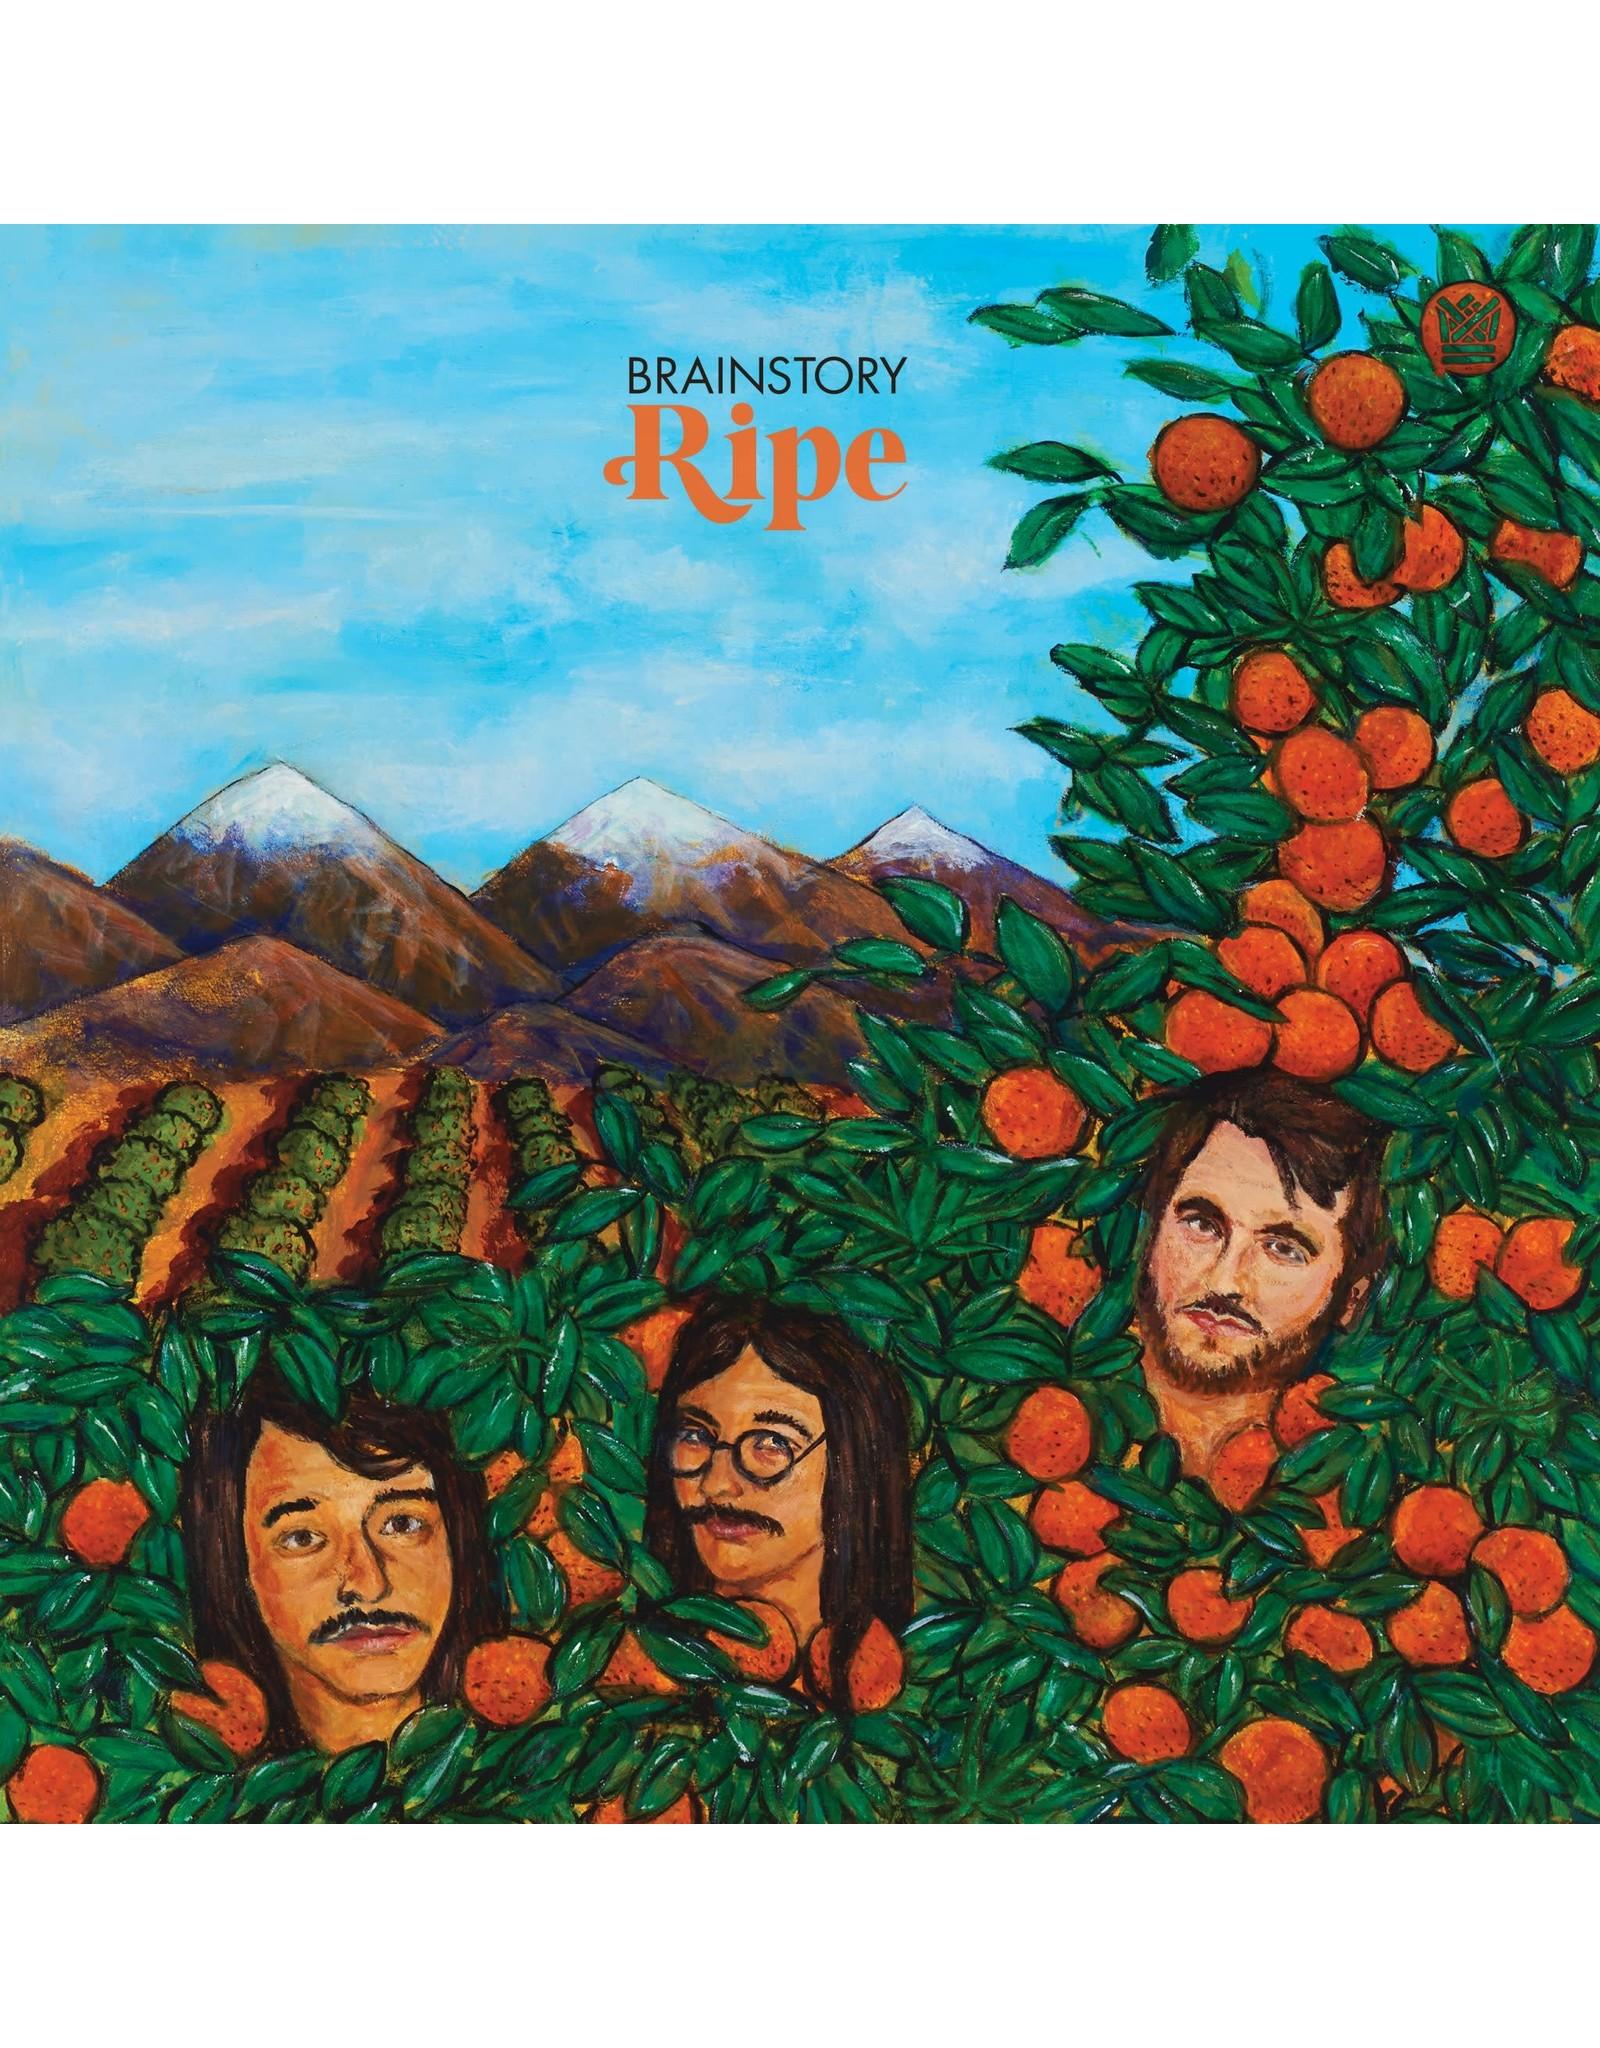 Big Crown Brainstory: Ripe EP (transparent with green & orange swirl) LP